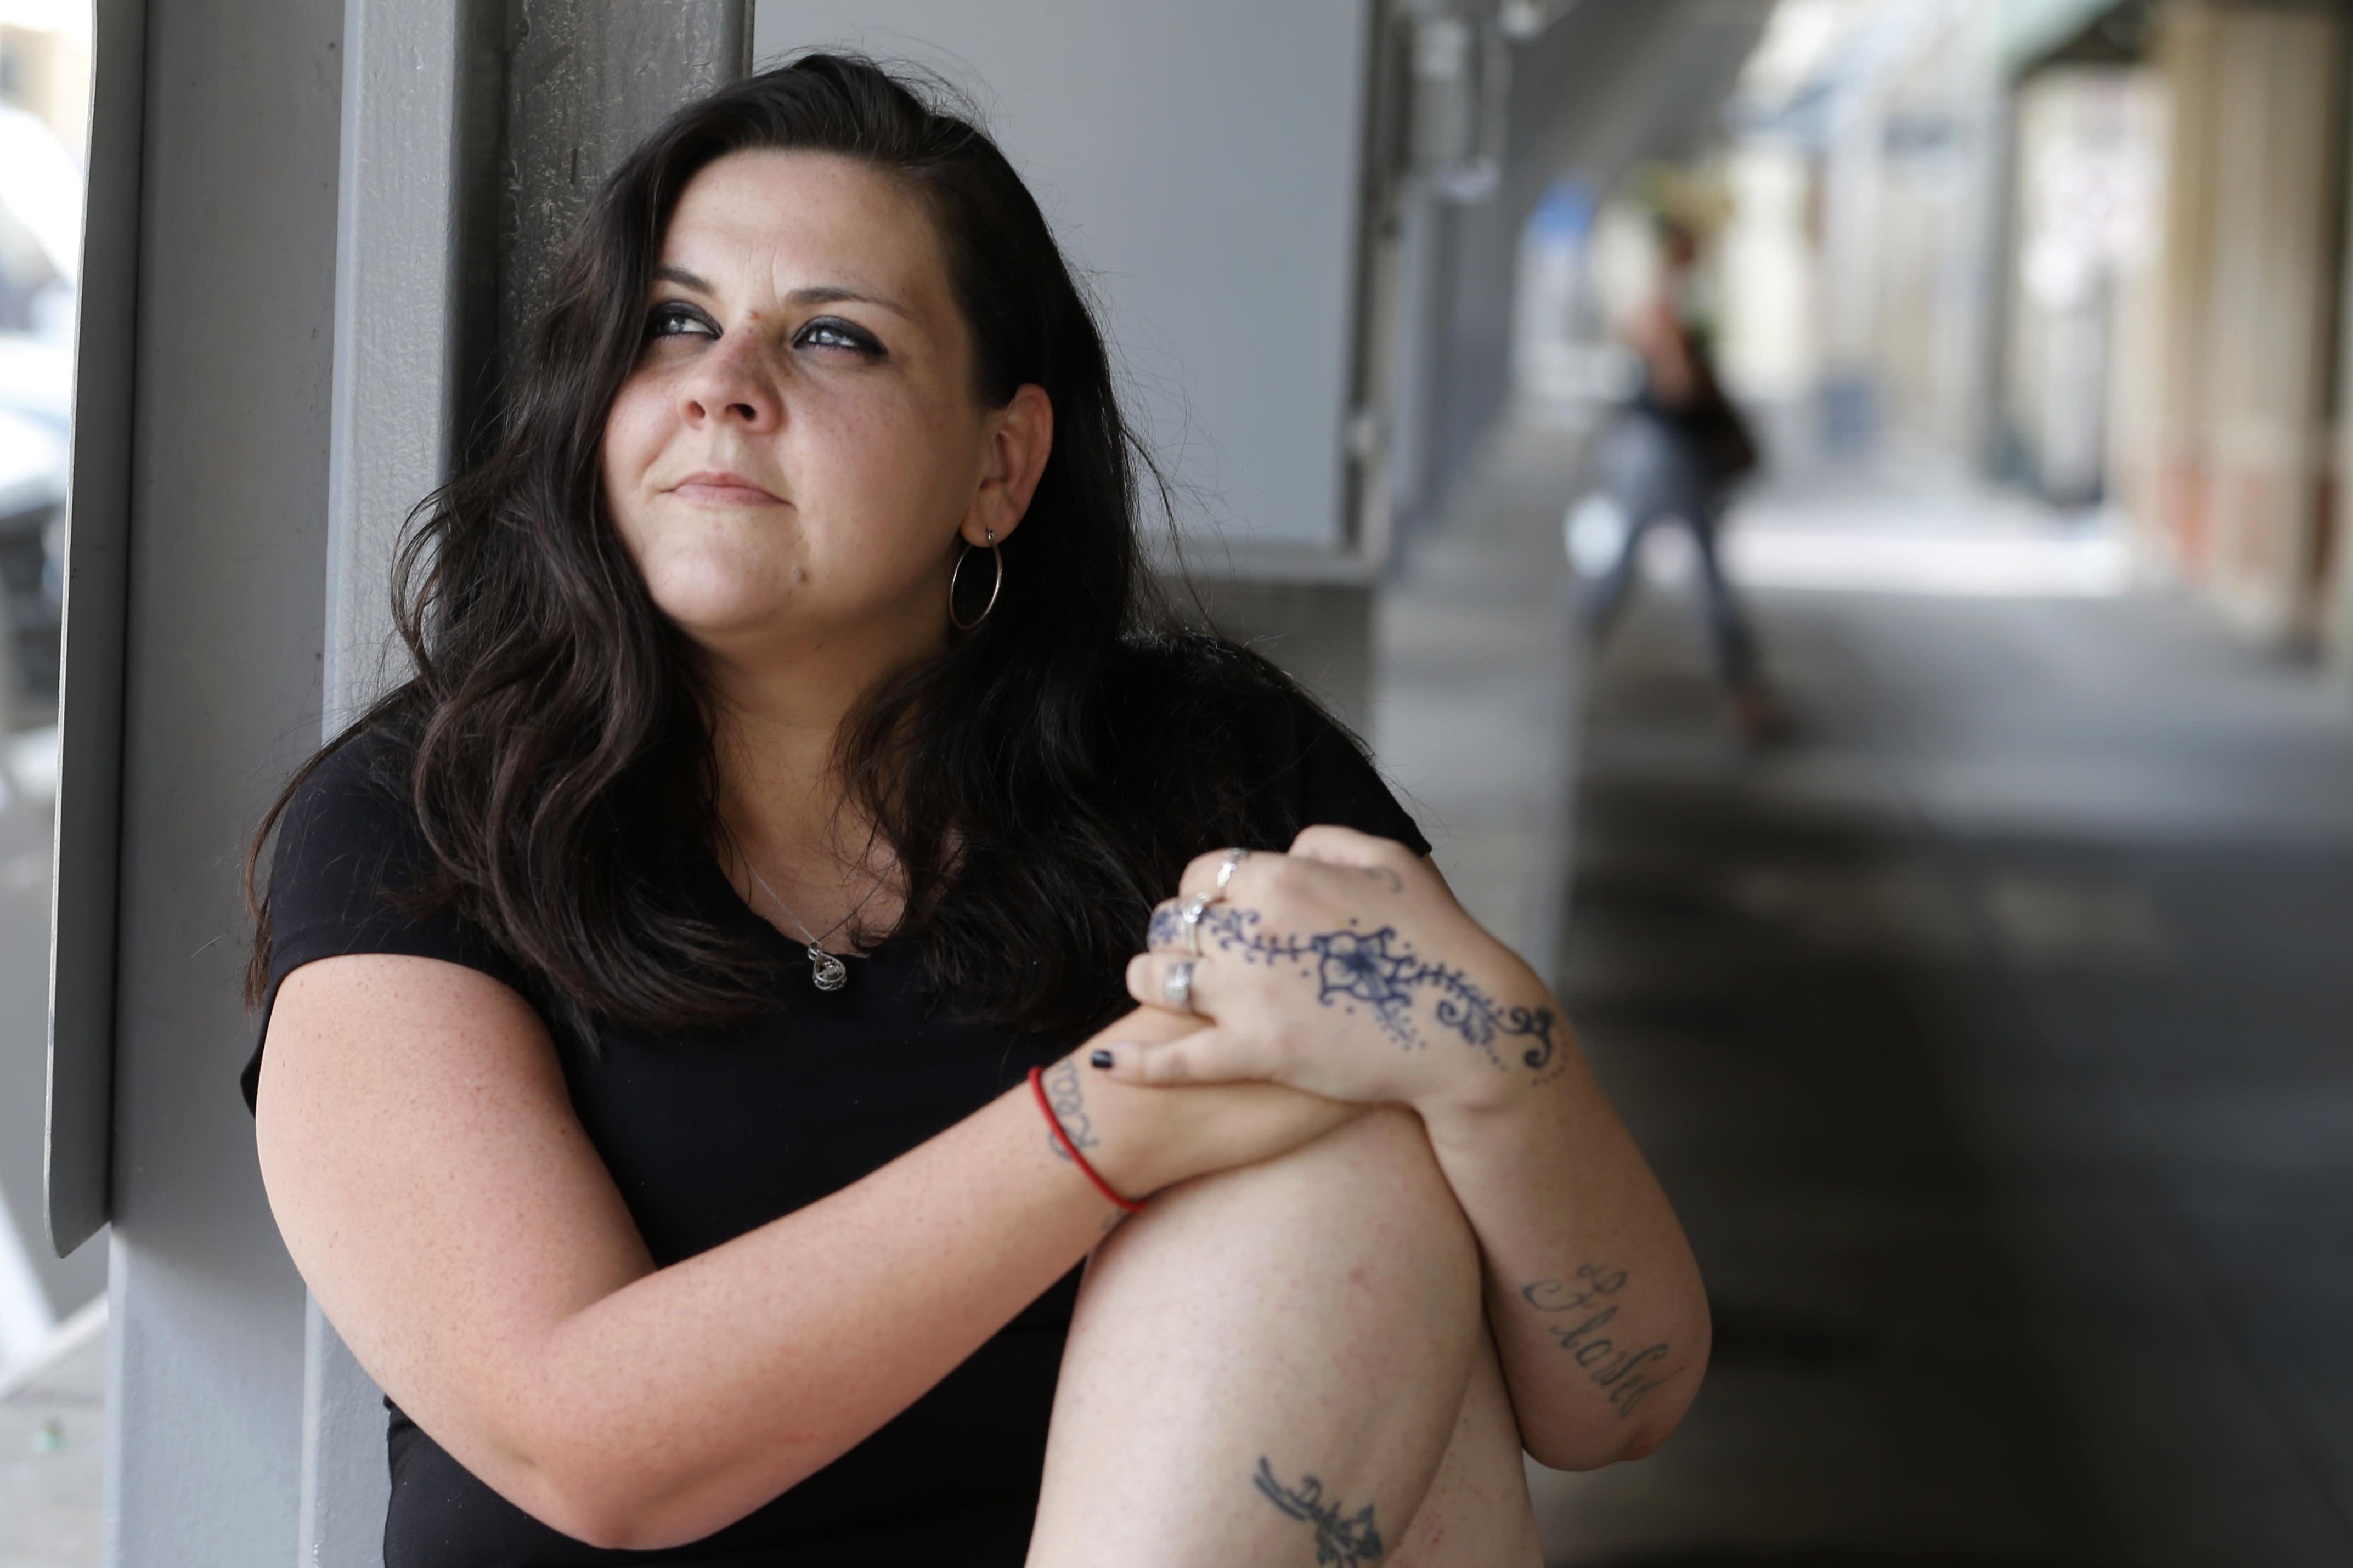 US prison populations down 8% amid coronavirus outbreak - yahoo